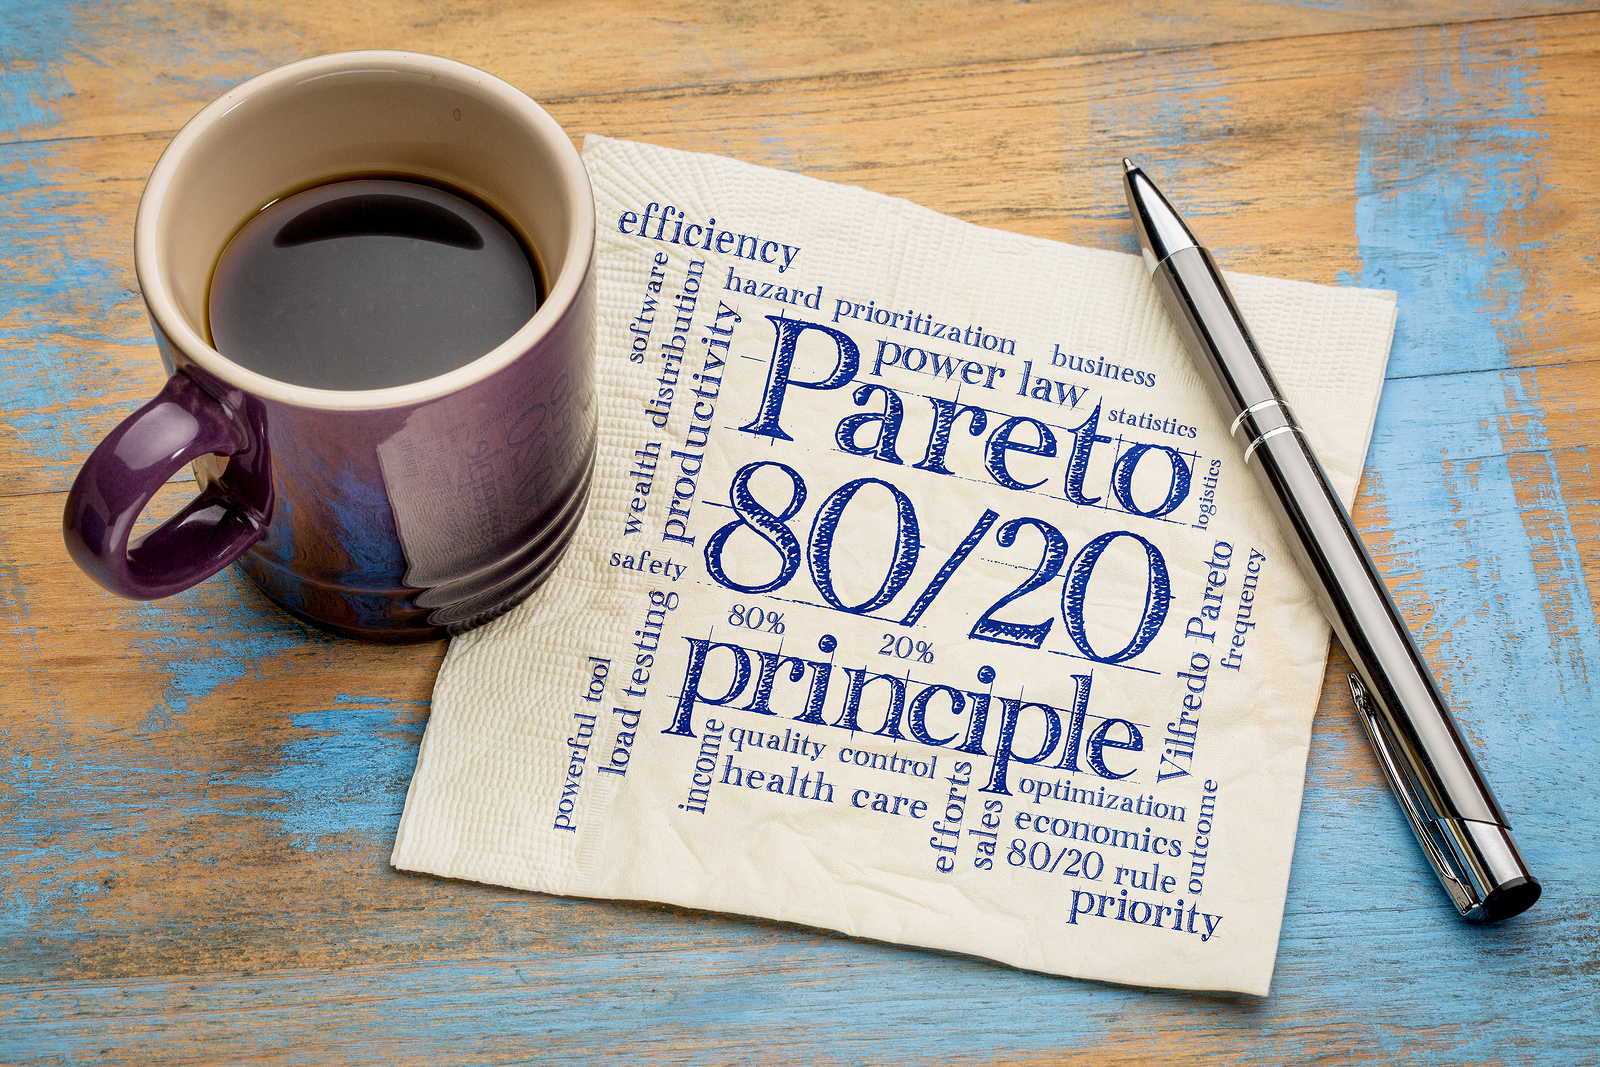 Pareto principle or eighty-twenty rule - word cloud on a napkin with a cup of coffee